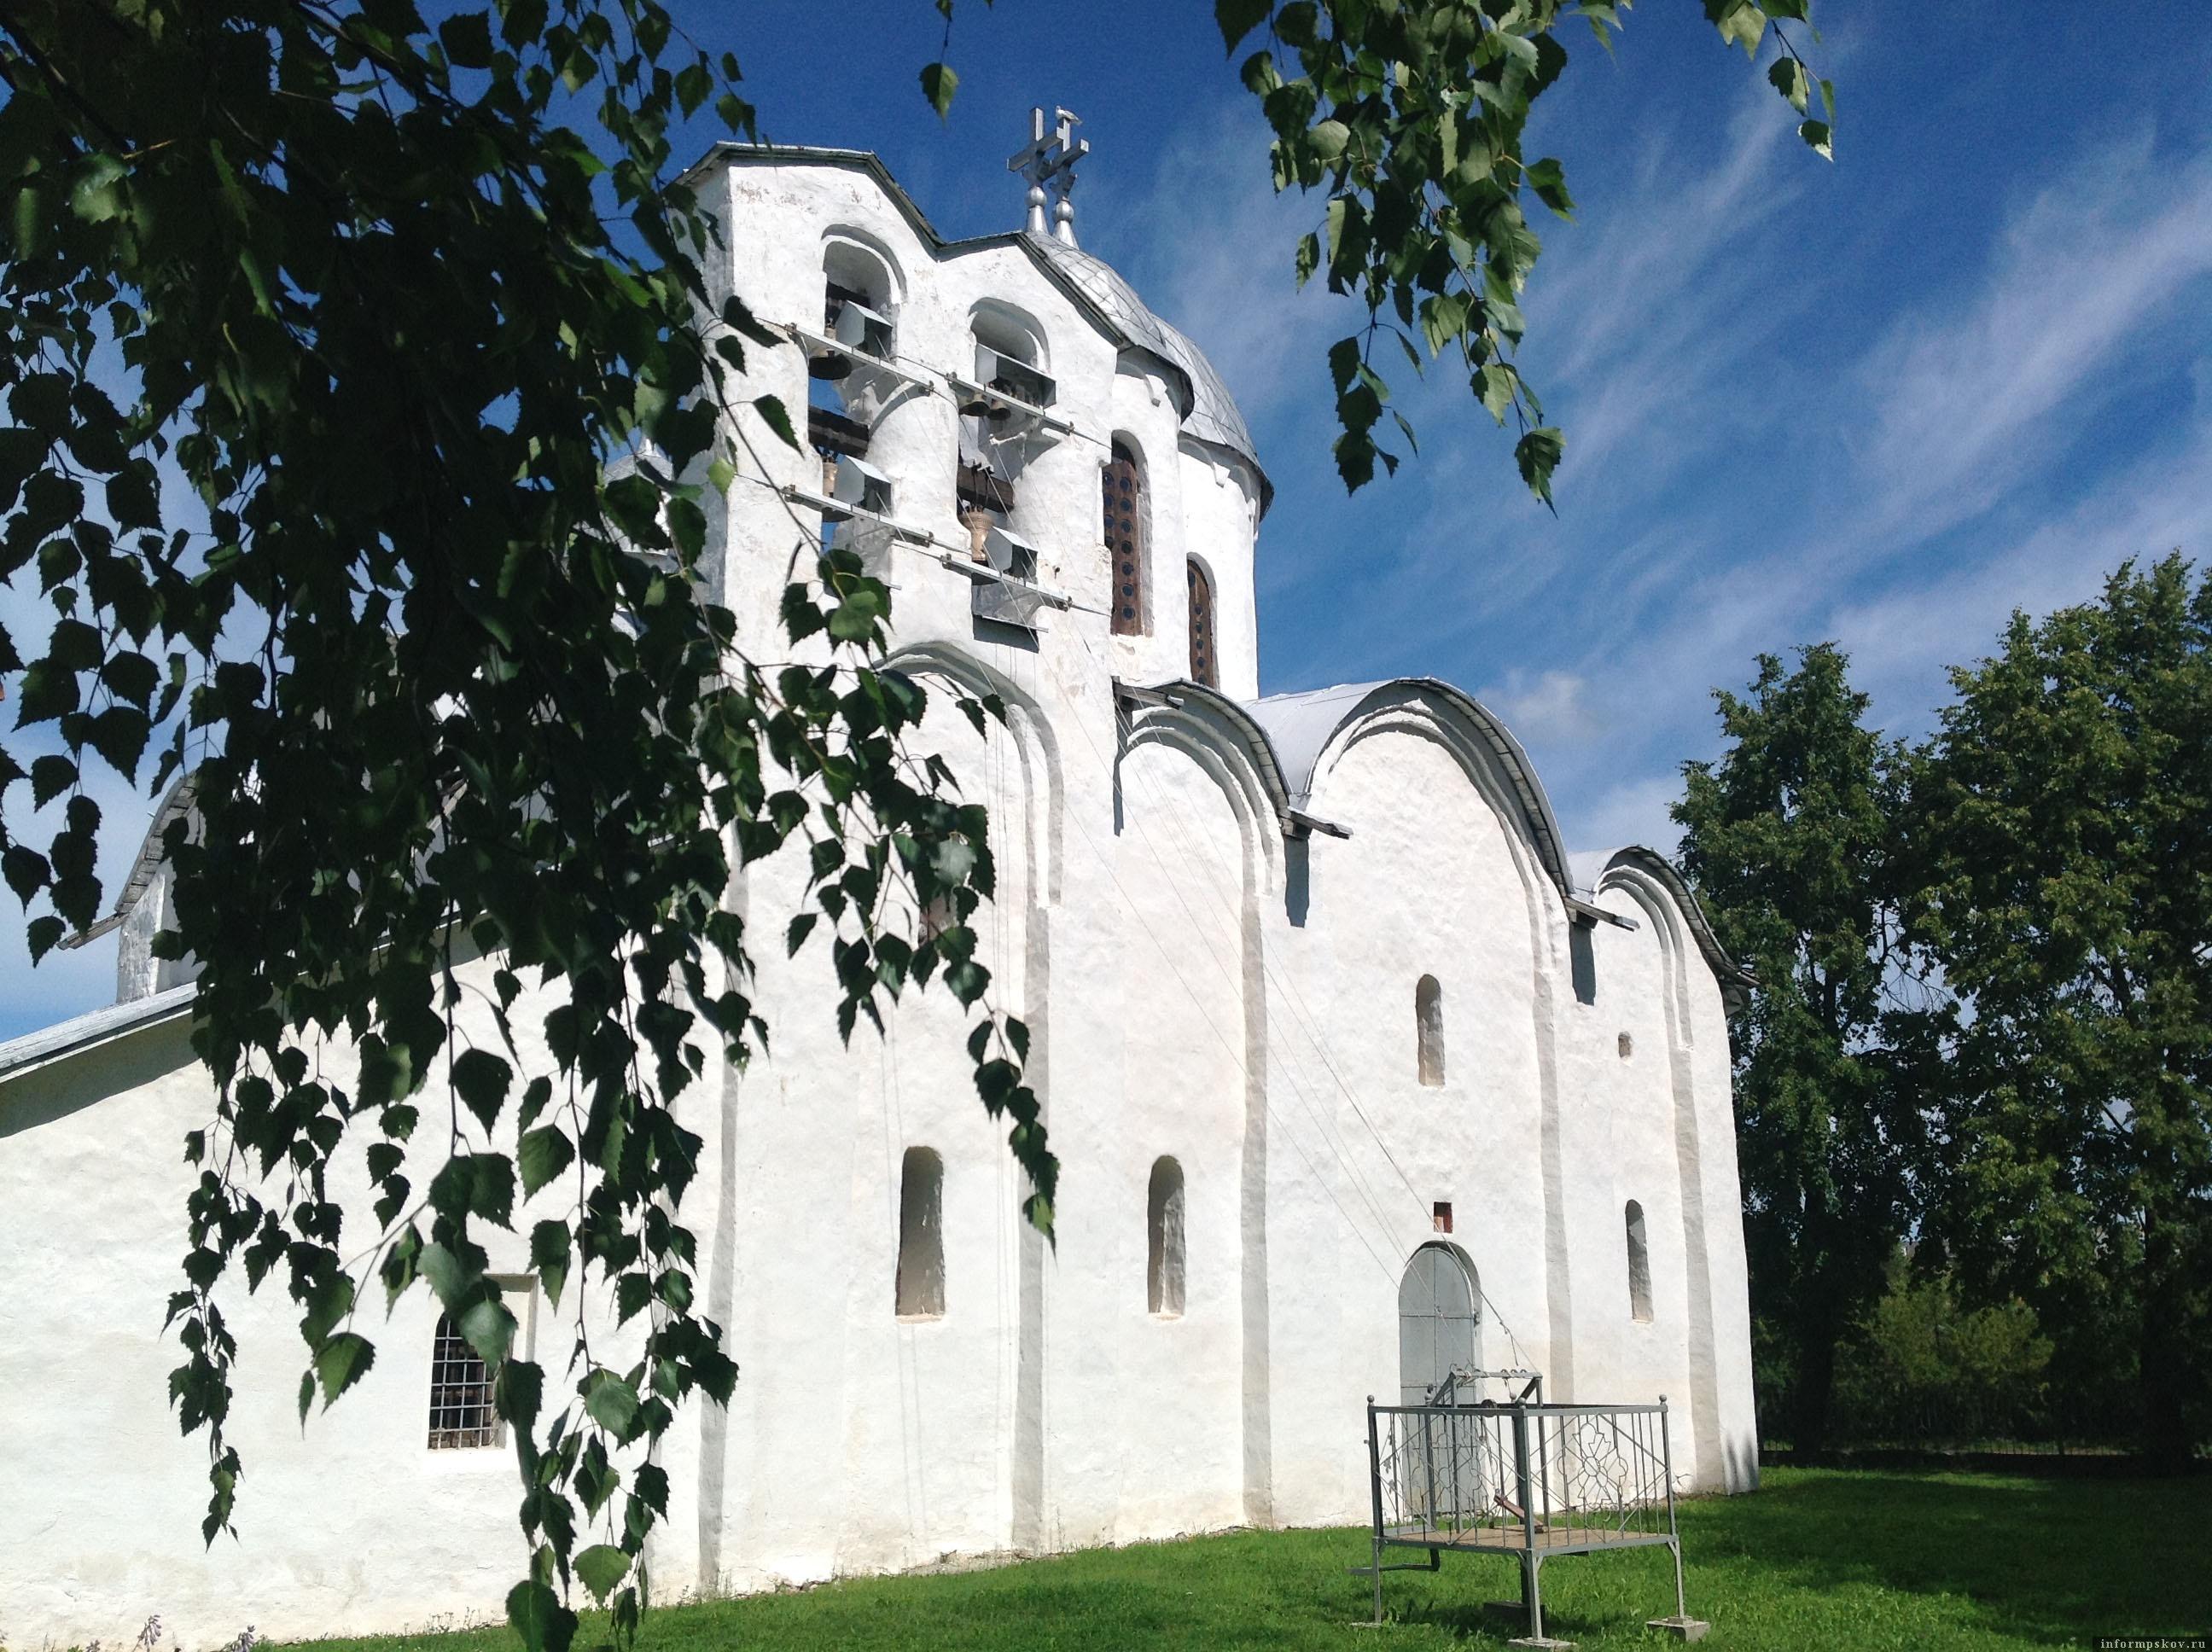 Фото предоставлено ТИЦ Псковской области.